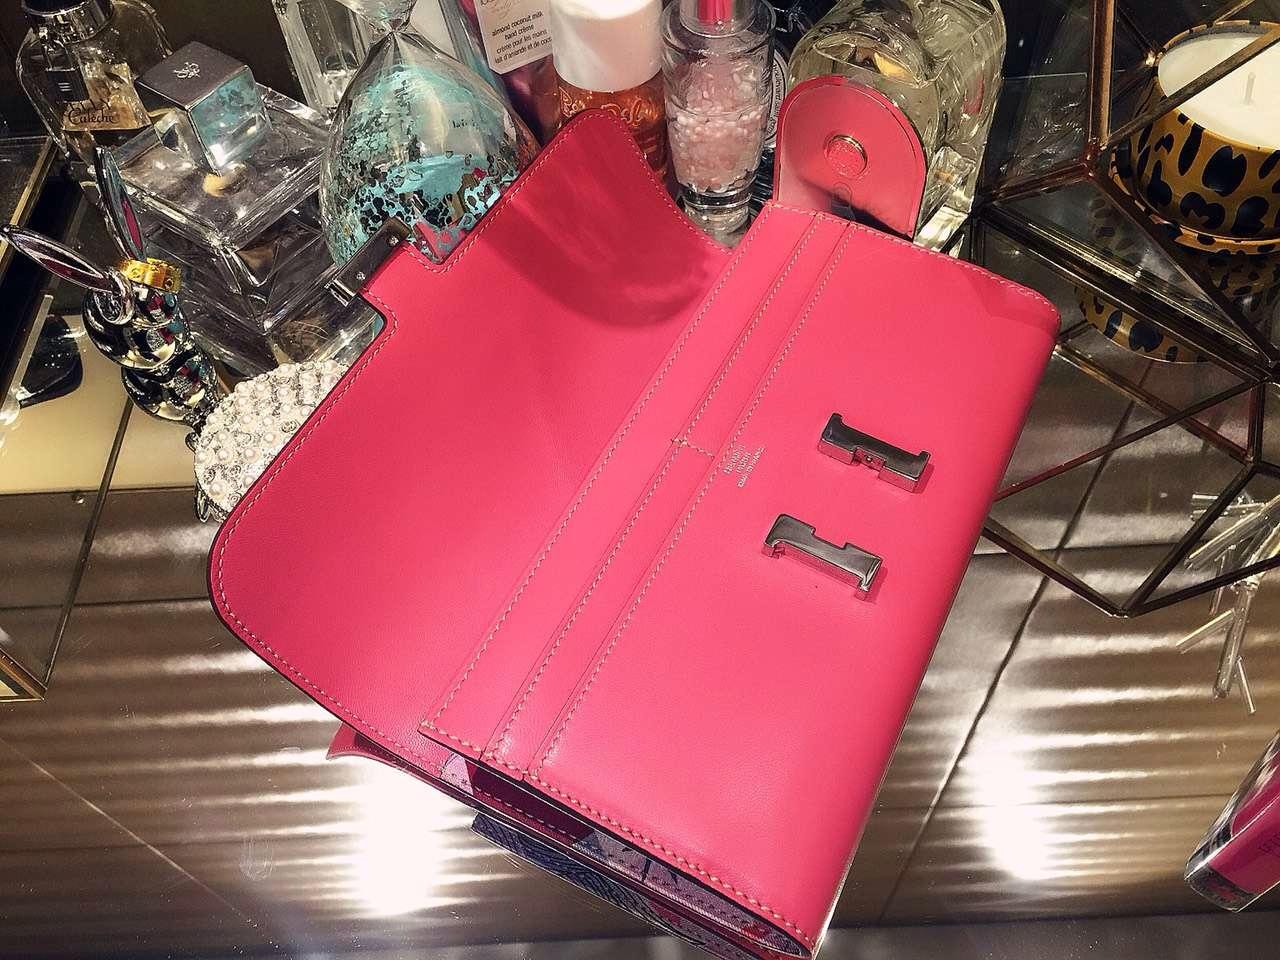 21CM Hermes Silk'in  Constance Long Wallet Fuchsia Pink Swift leather Clutch Bag